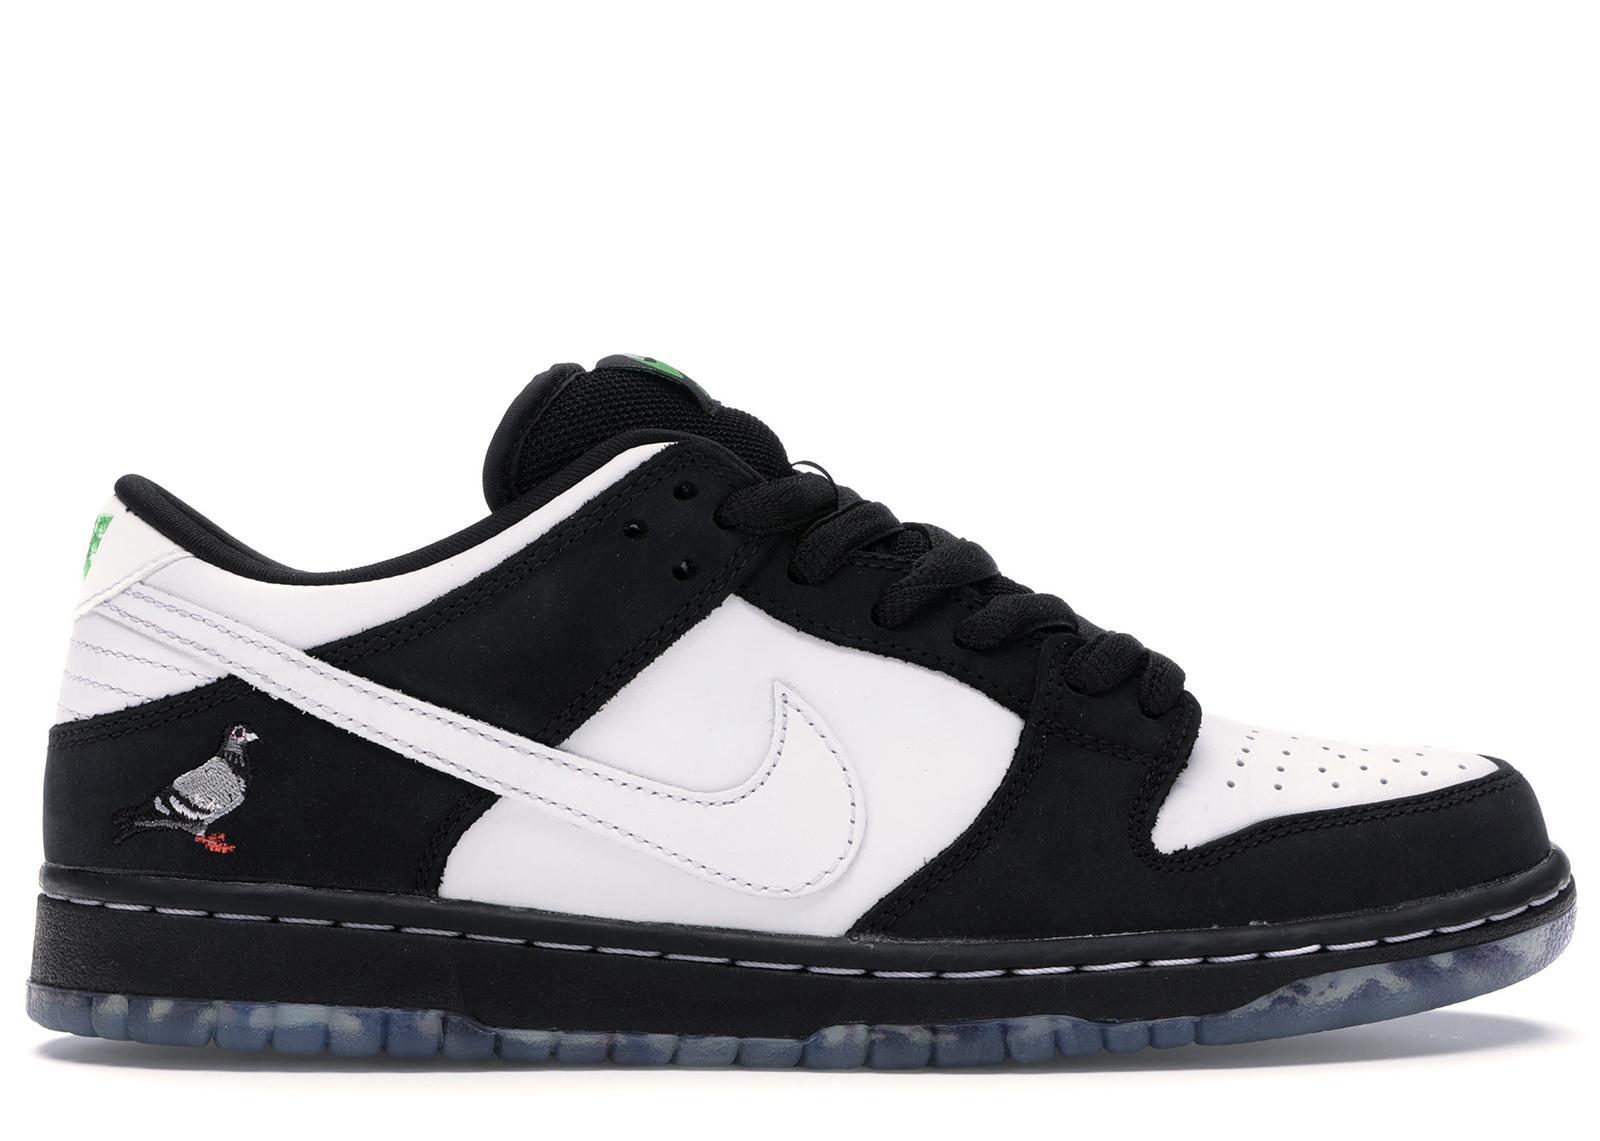 Nike Sb Dunk Low Staple Panda Pigeon in